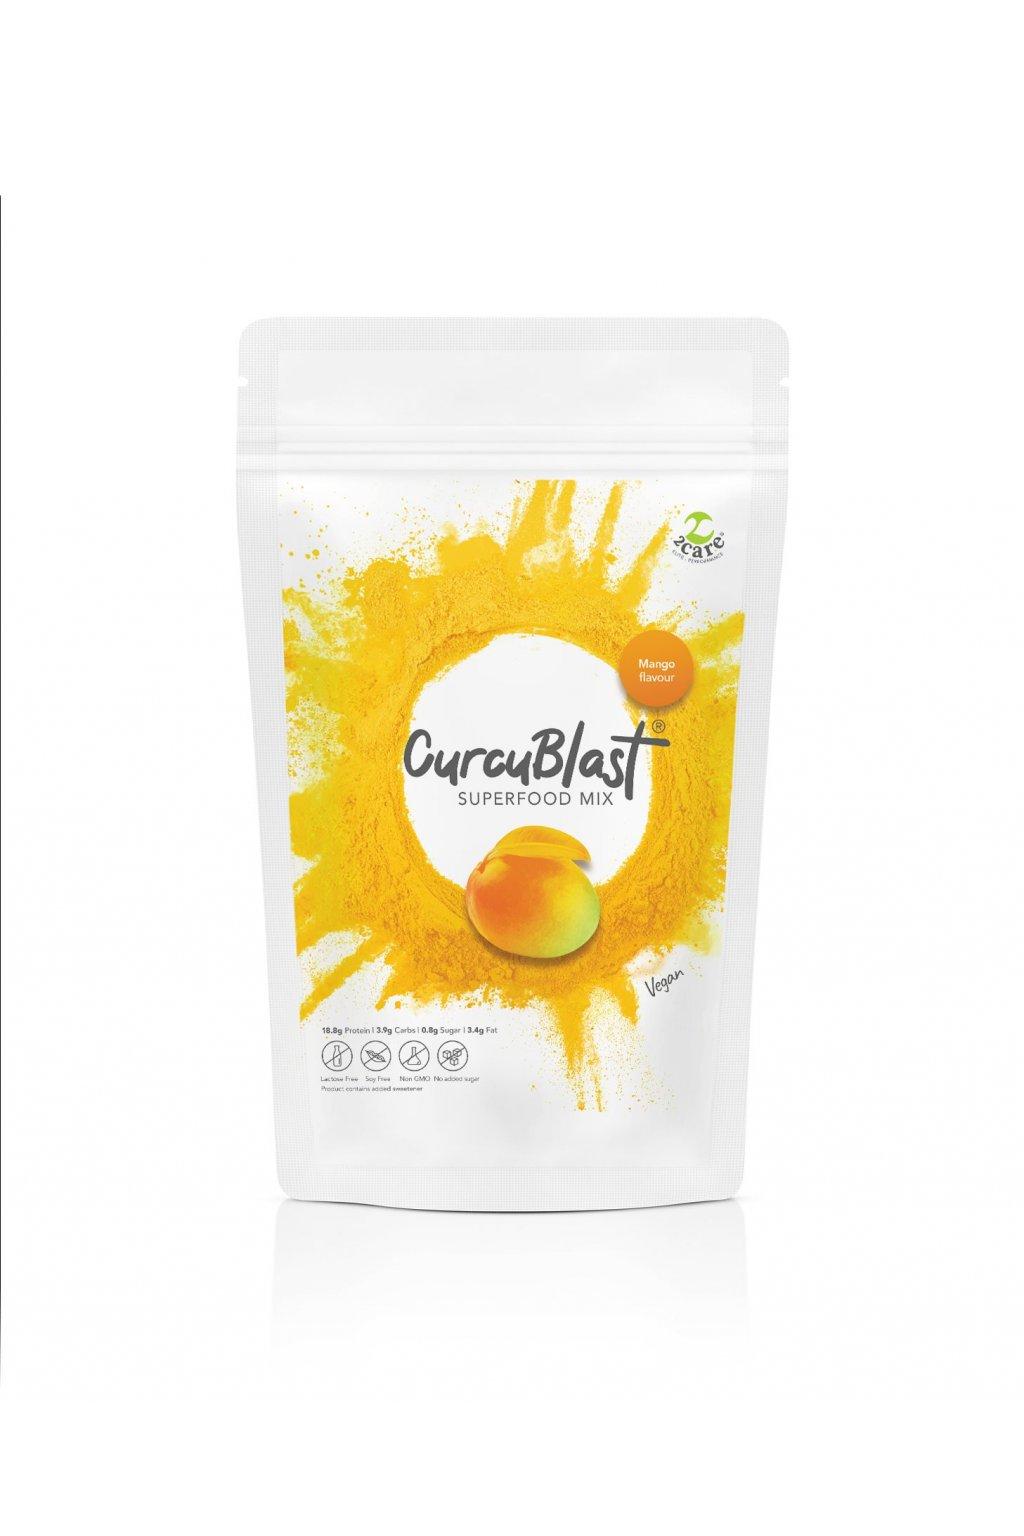 Mango flavoured turmeric infused vegan protein